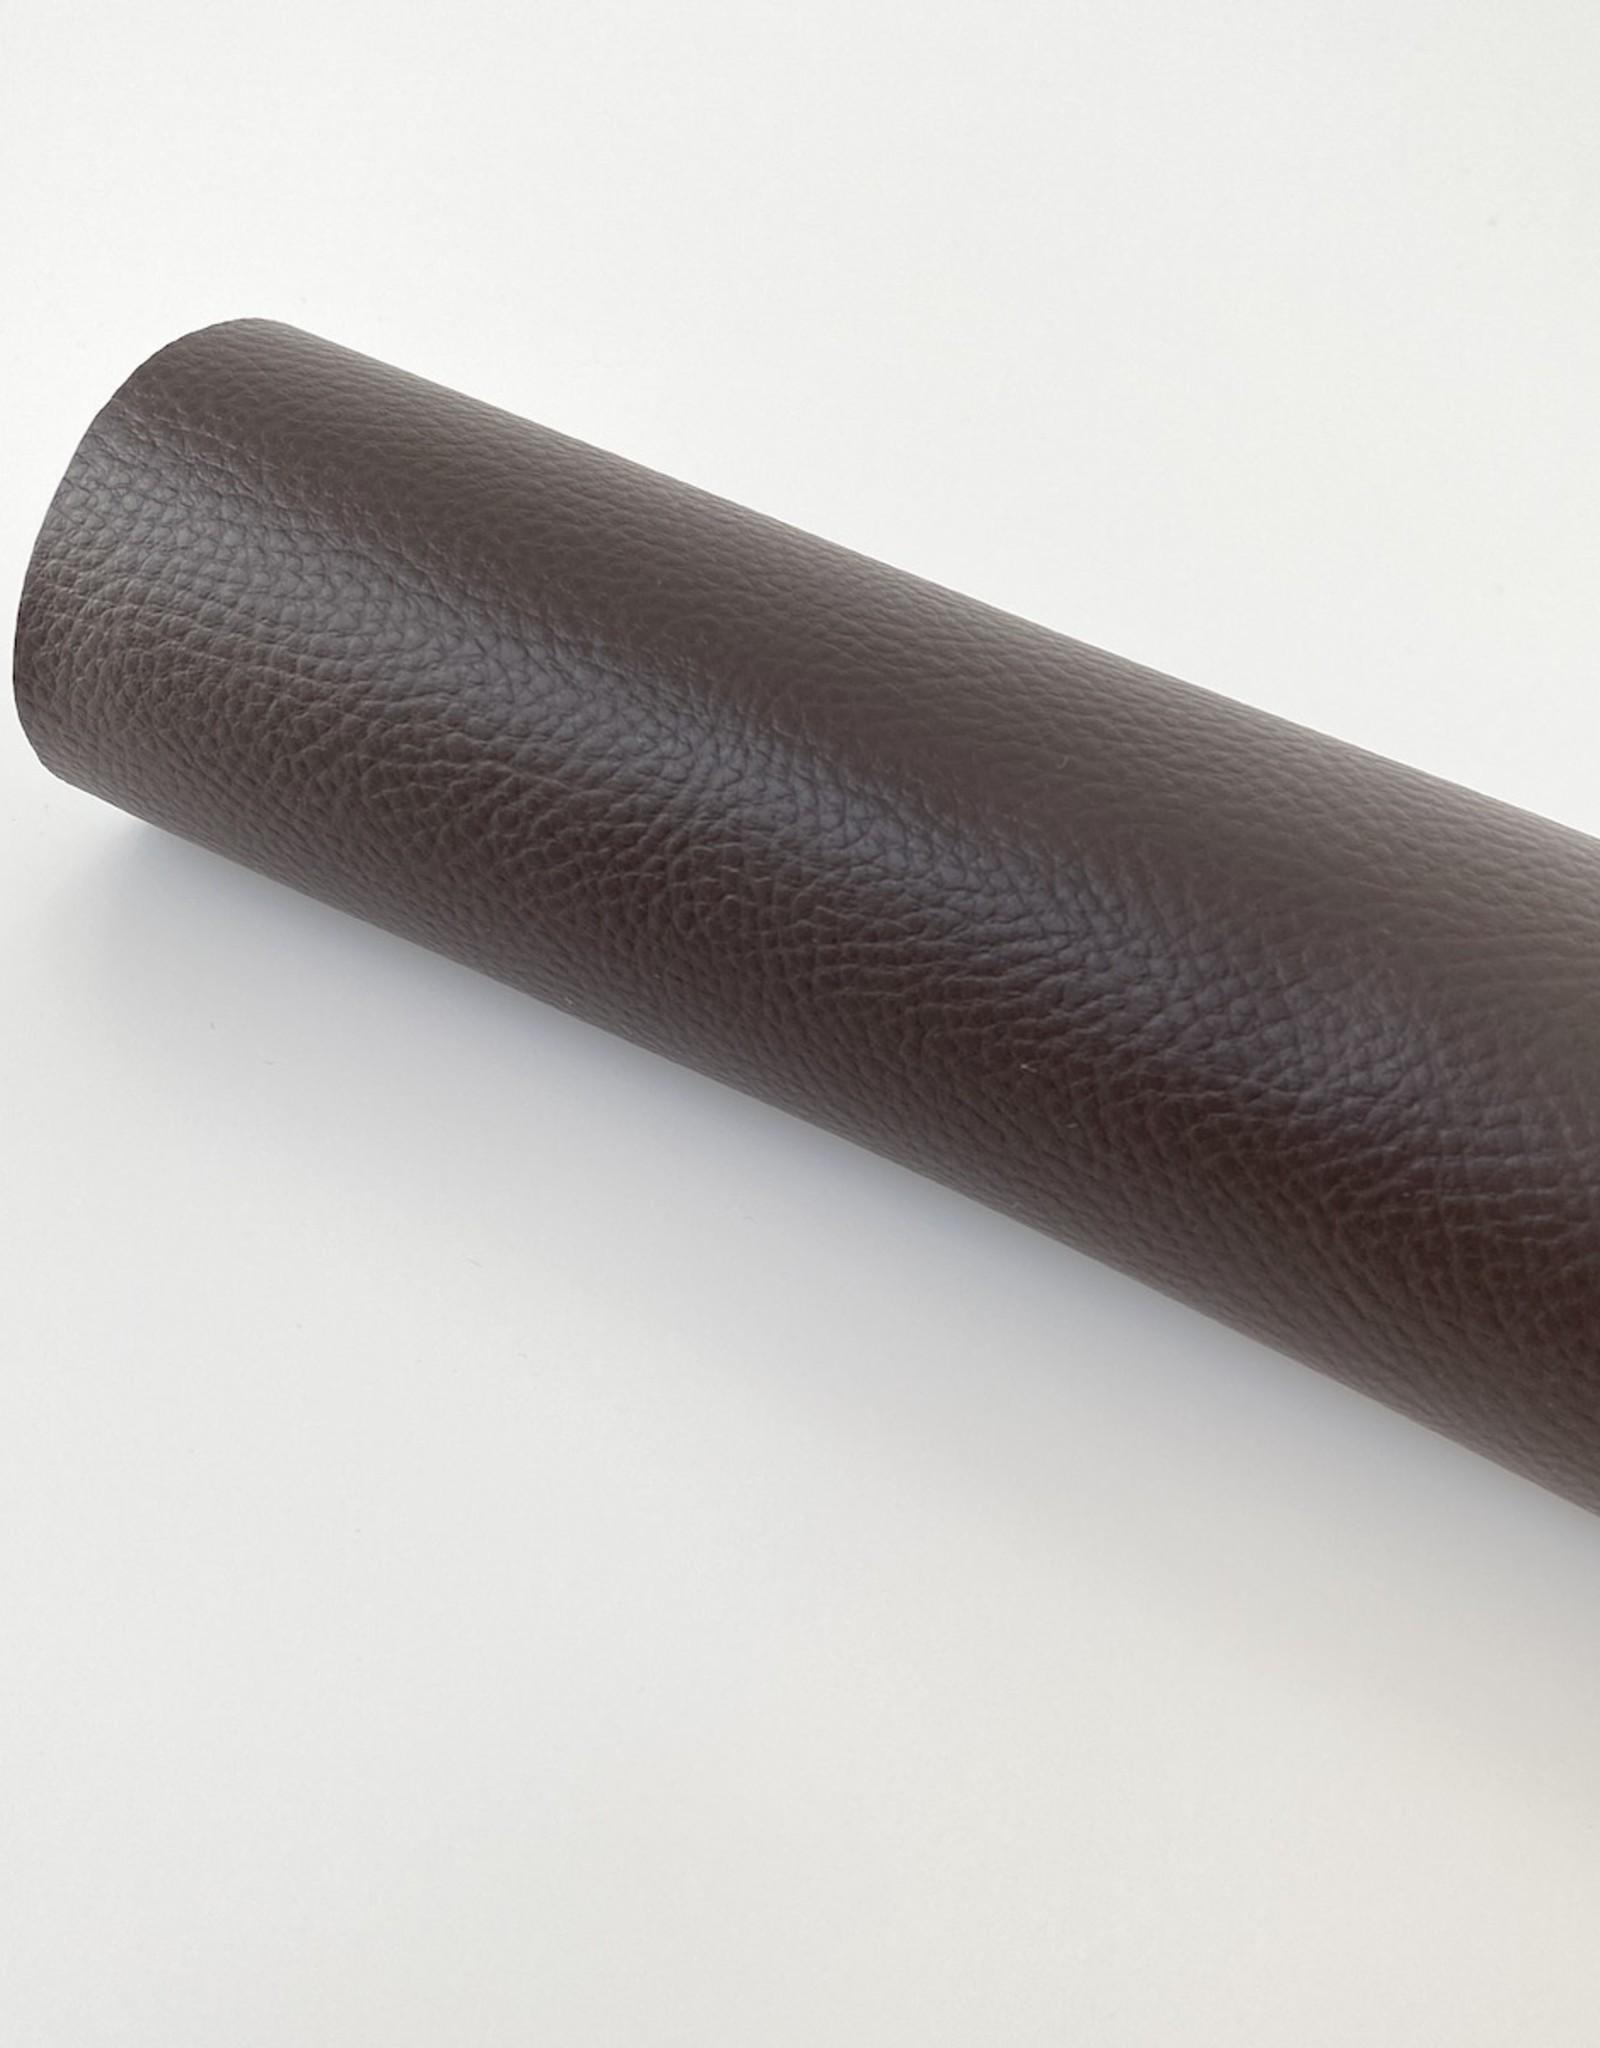 Kunstleer - 50 x 70 cm - Chocolade